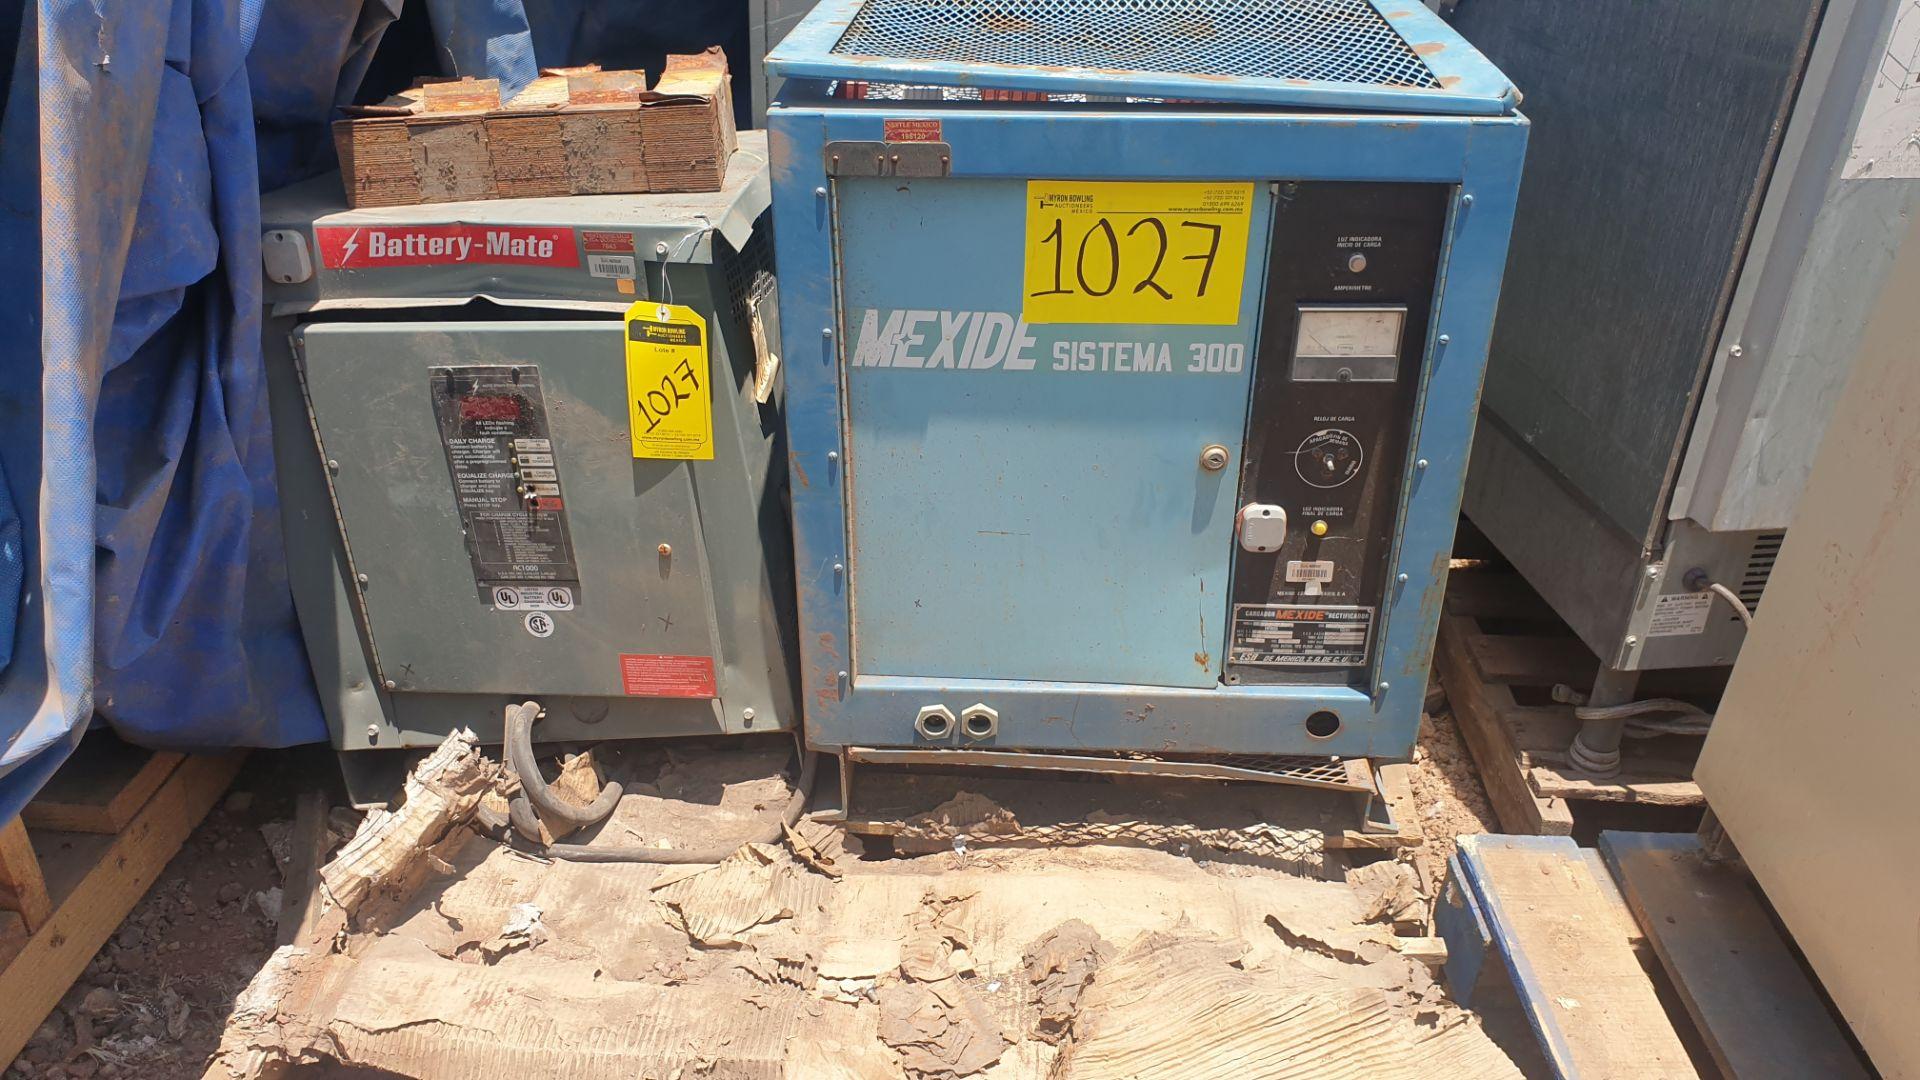 1 Battery-Mate charger, model 1050H3-18C 208/240/480V, 1 Mexide charger model CAS18.3.700 - Image 2 of 9